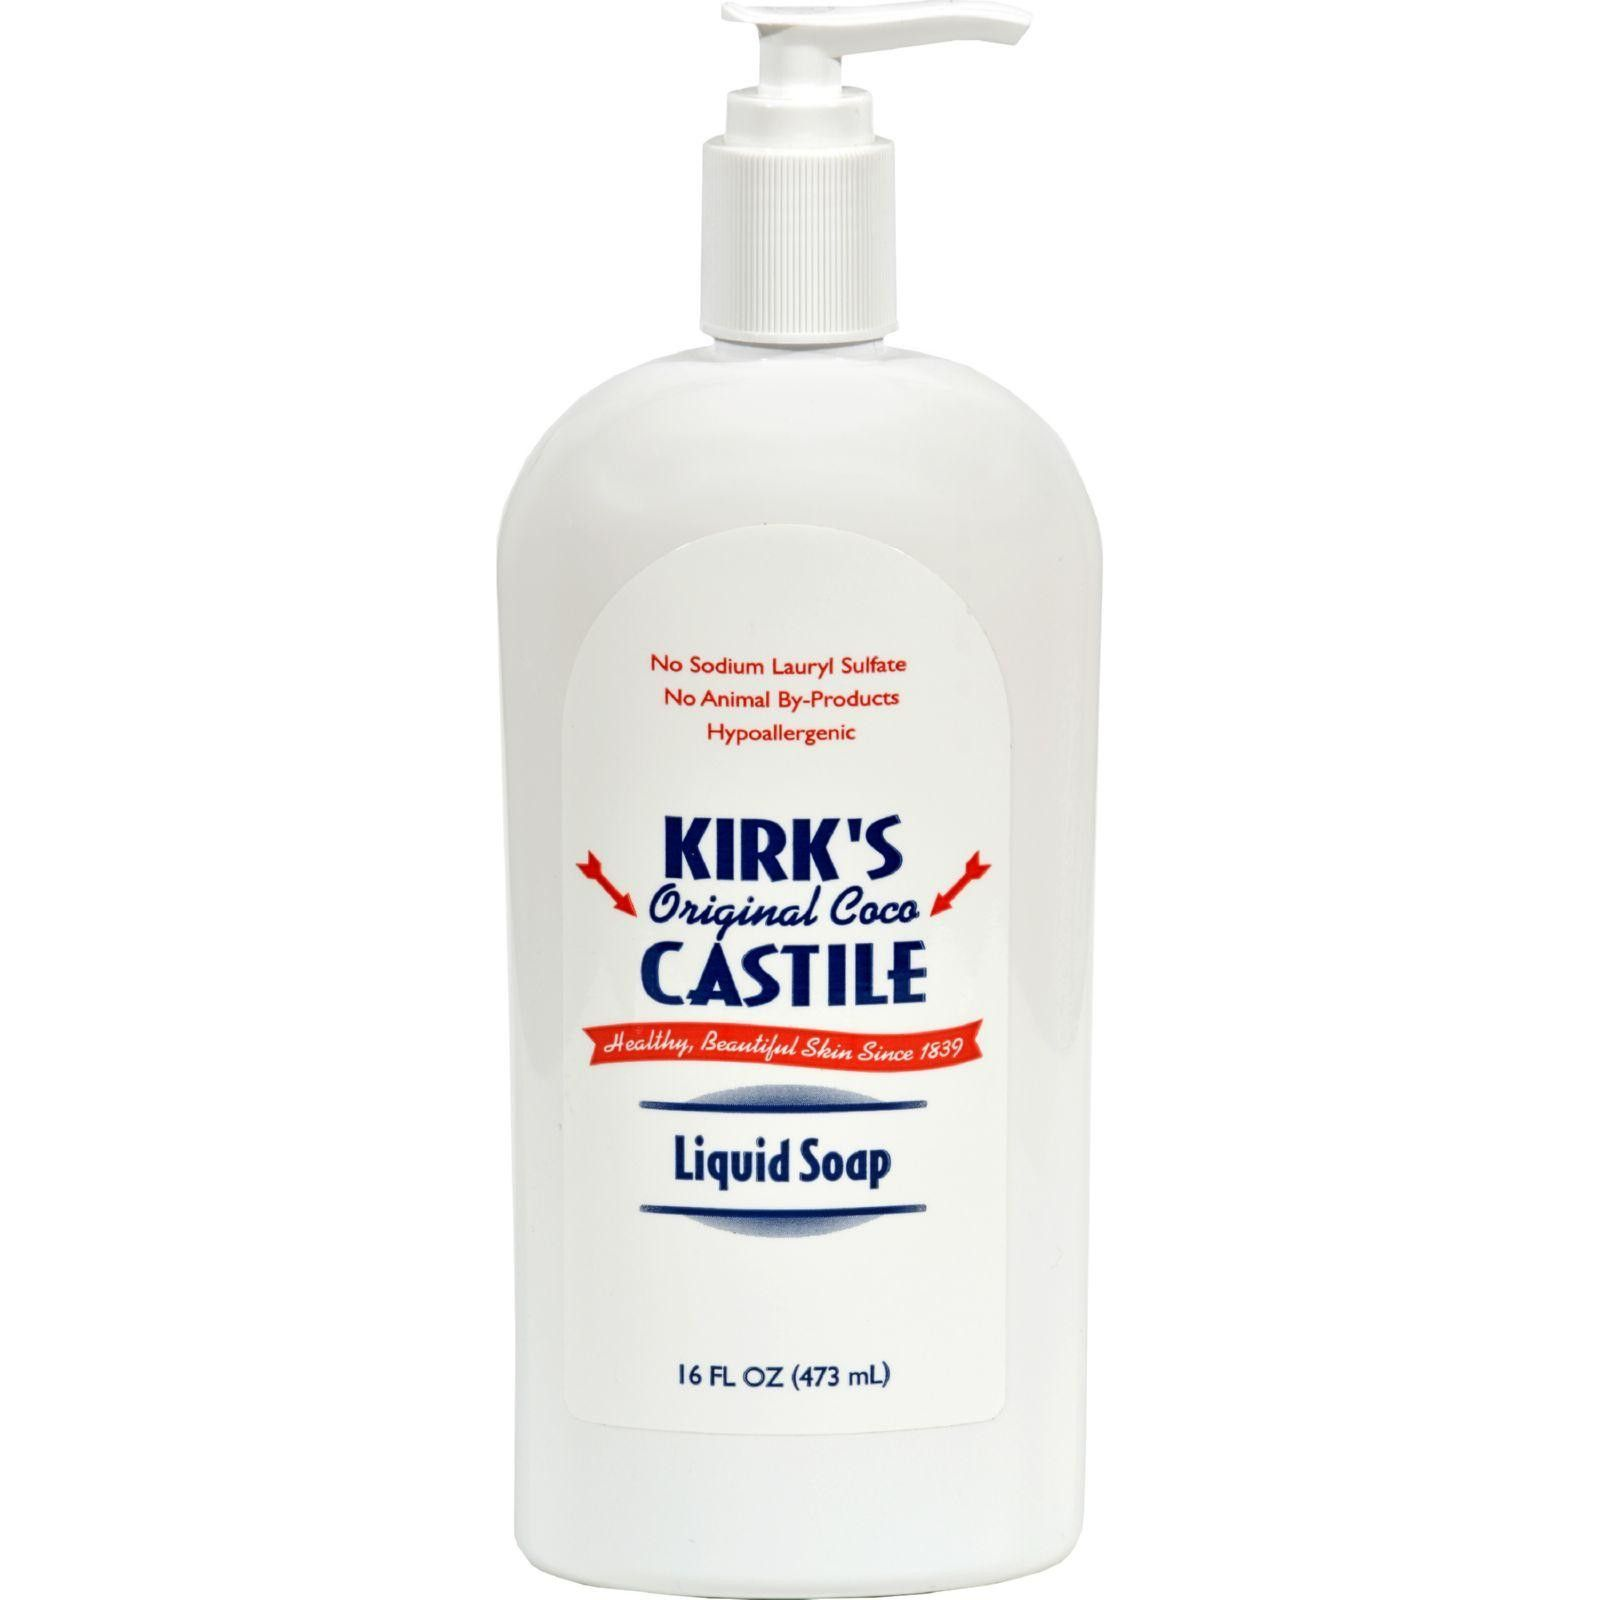 Kirk's Natural Original Coco Castile Liquid Soap With Pump - 16 Fl Oz  #love #inspiredbeacon #organic  #LiquidHandSoap #BodyCare